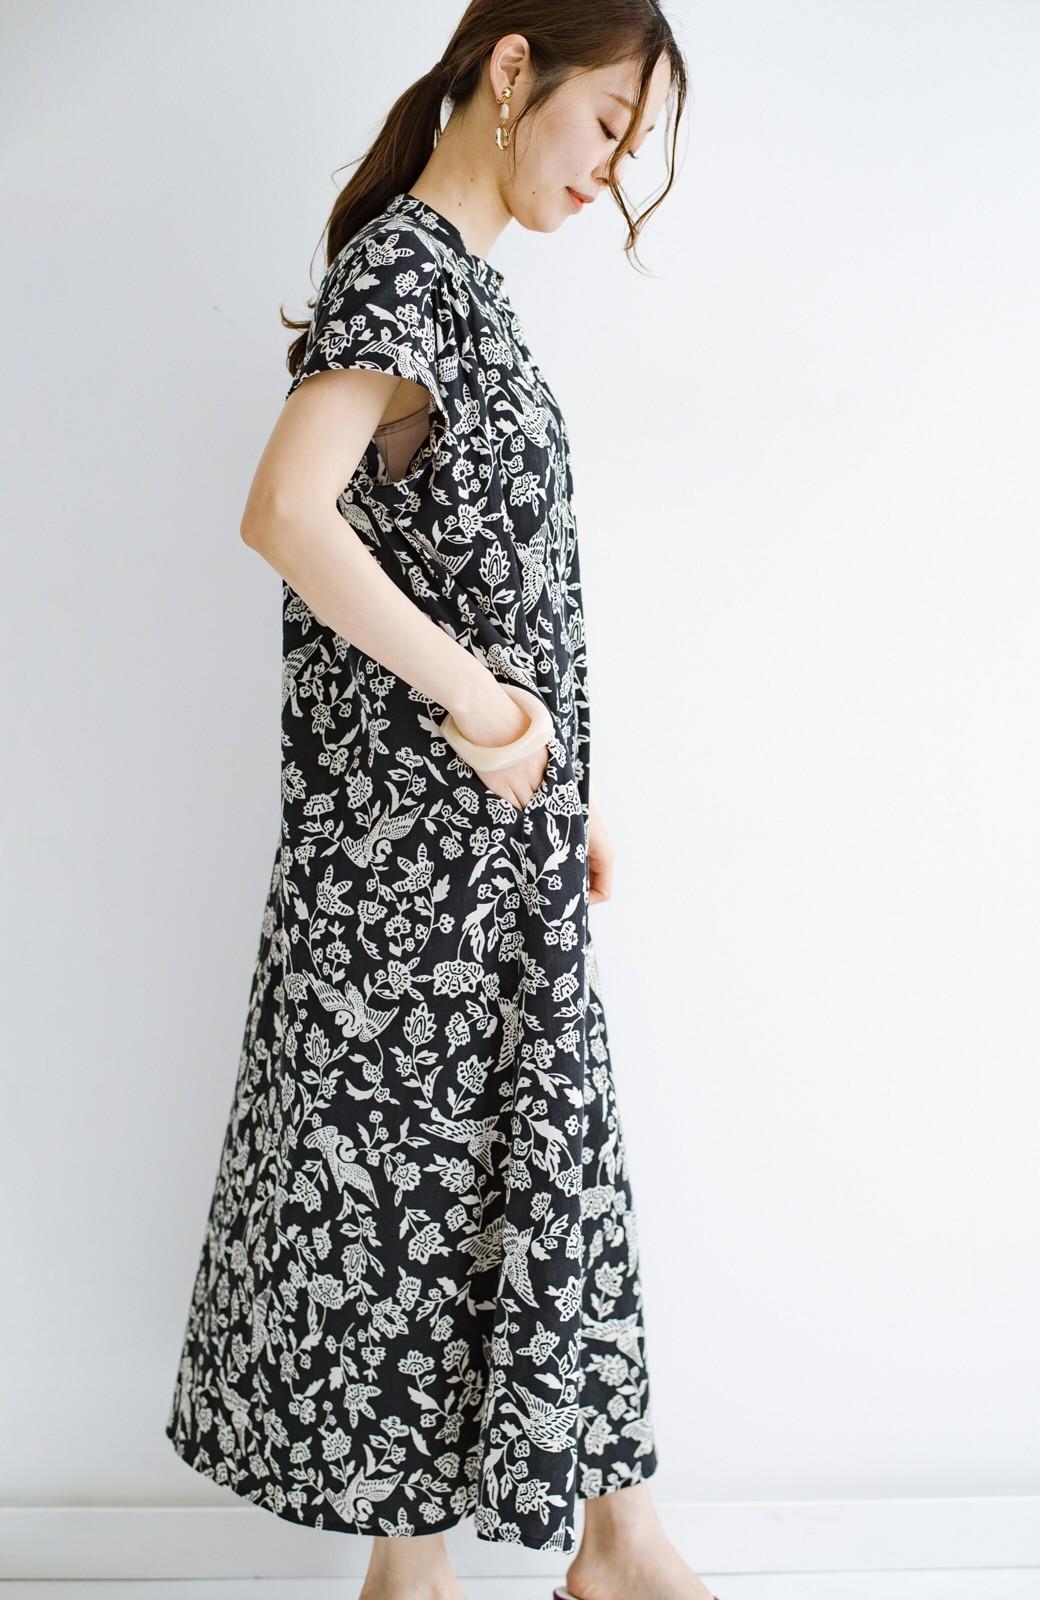 haco! 京都の浴衣屋さんと作った浴衣生地の羽織ってもかわいいロングワンピース <ブラック系その他>の商品写真22